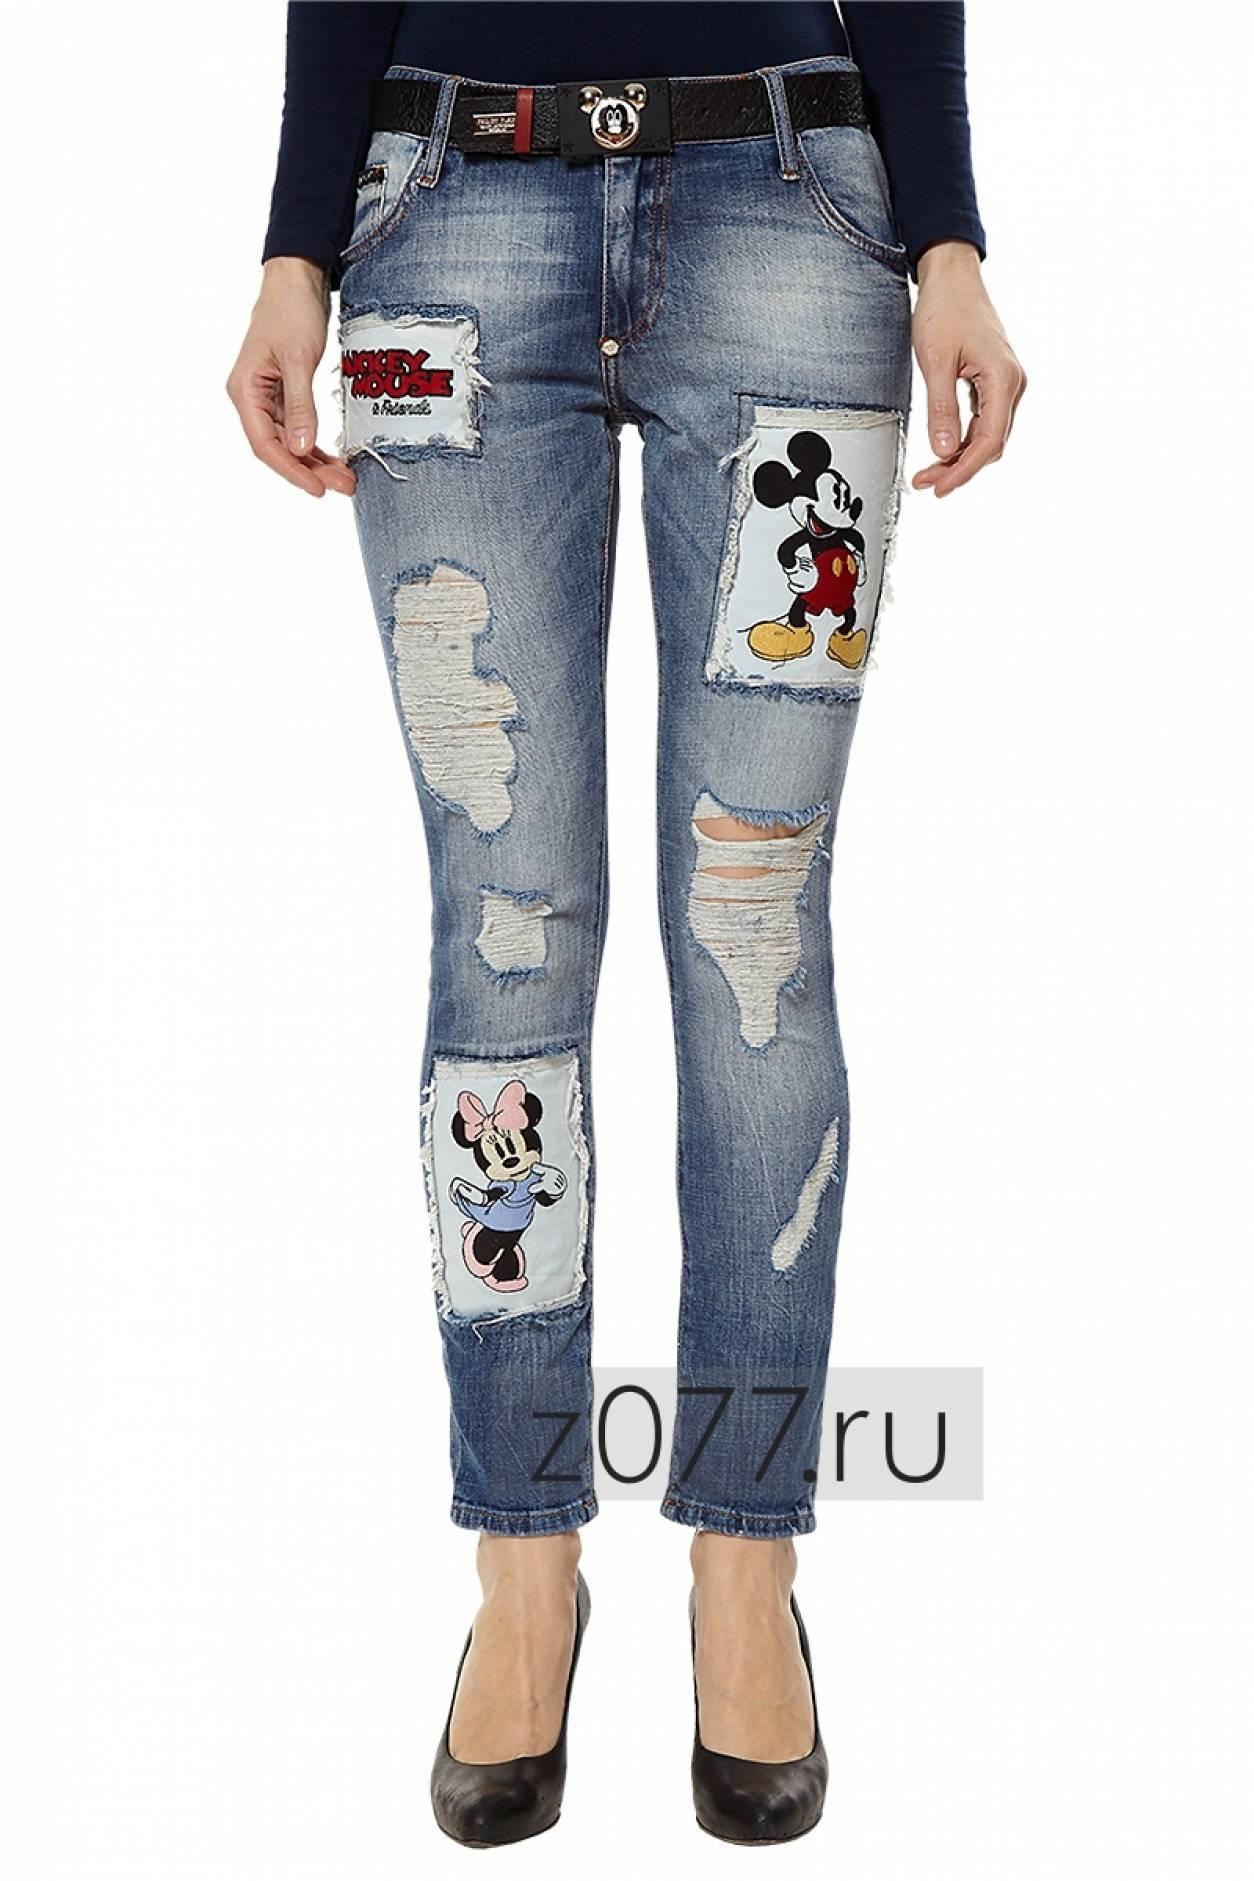 Интернет магазин джинсы бойфренды